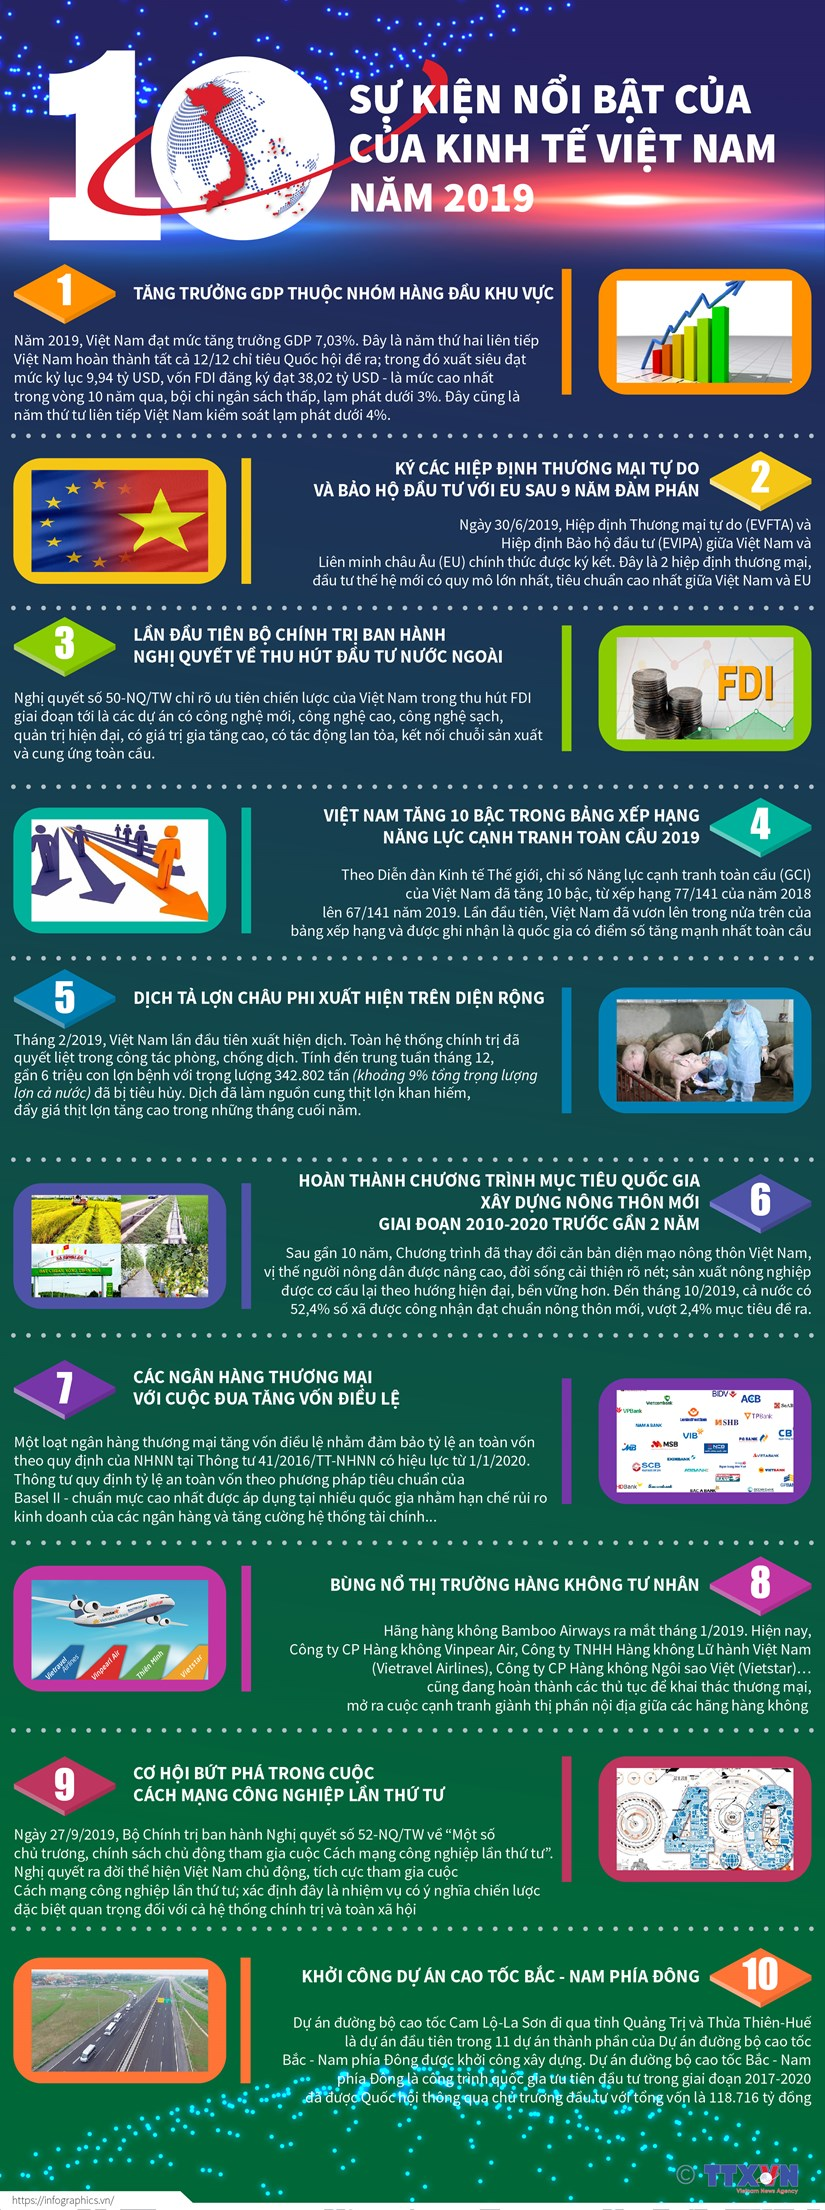 [Infographics] 10 su kien noi bat cua kinh te Viet Nam nam 2019 hinh anh 1